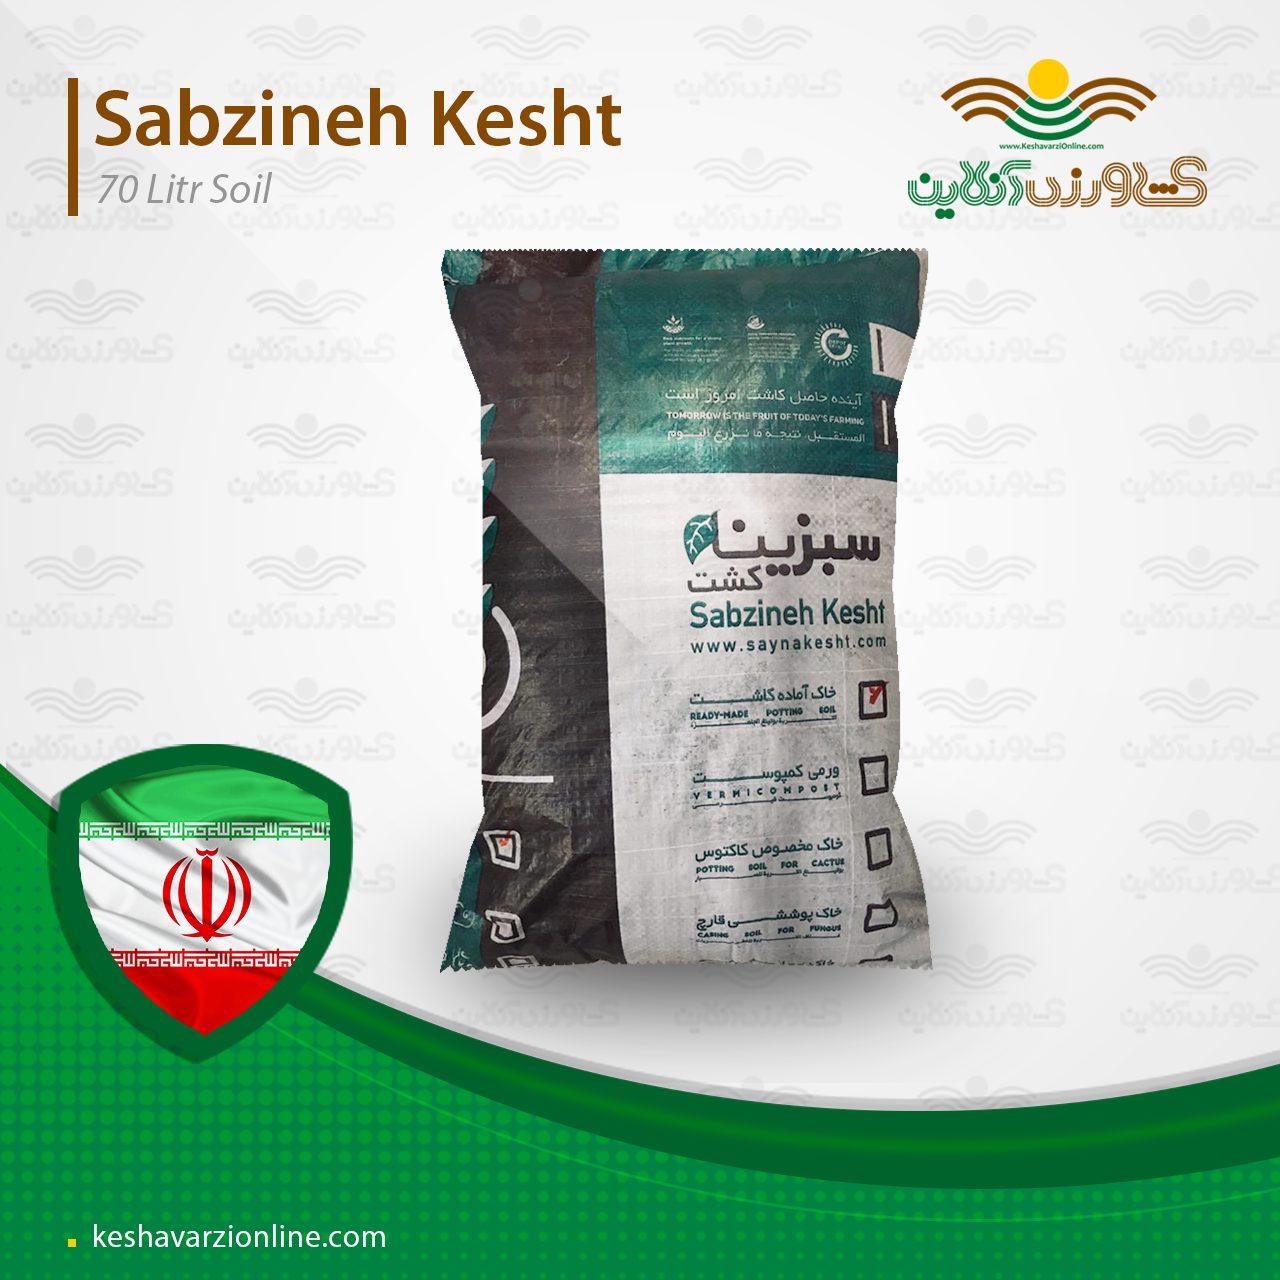 خاک آماده کاشت 70 لیتری مخصوص انواع گیاهان